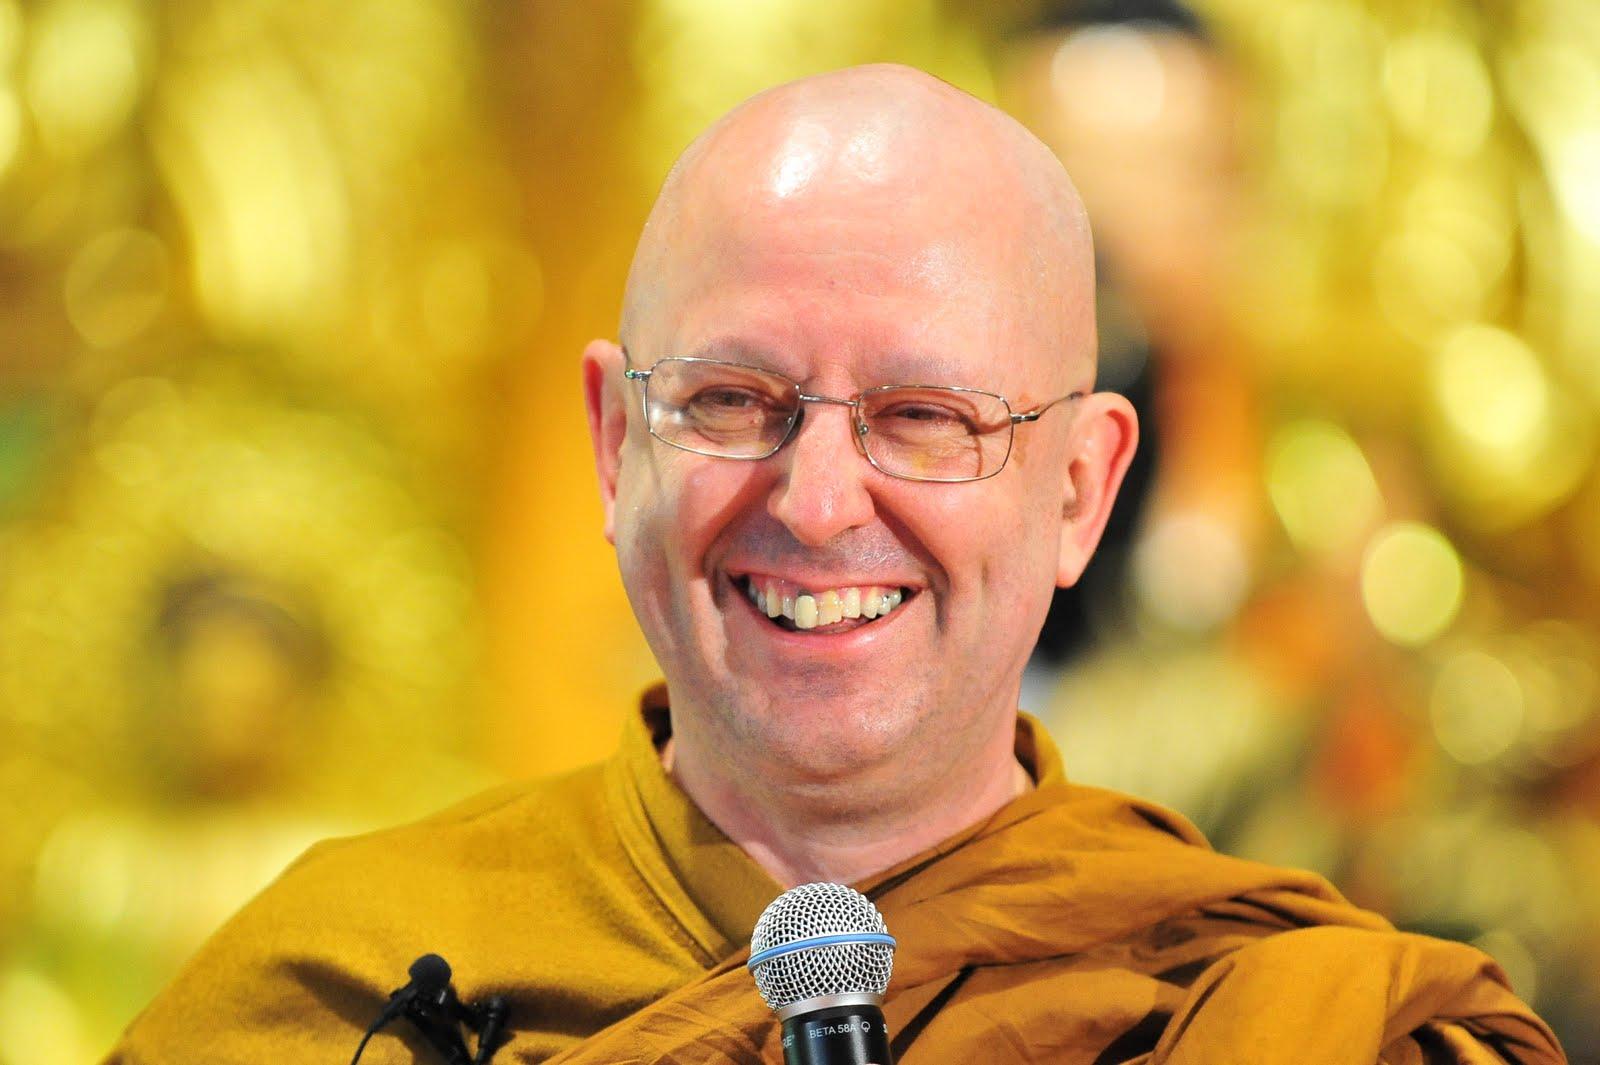 ajahn-brahm - Buddhist Fellowship